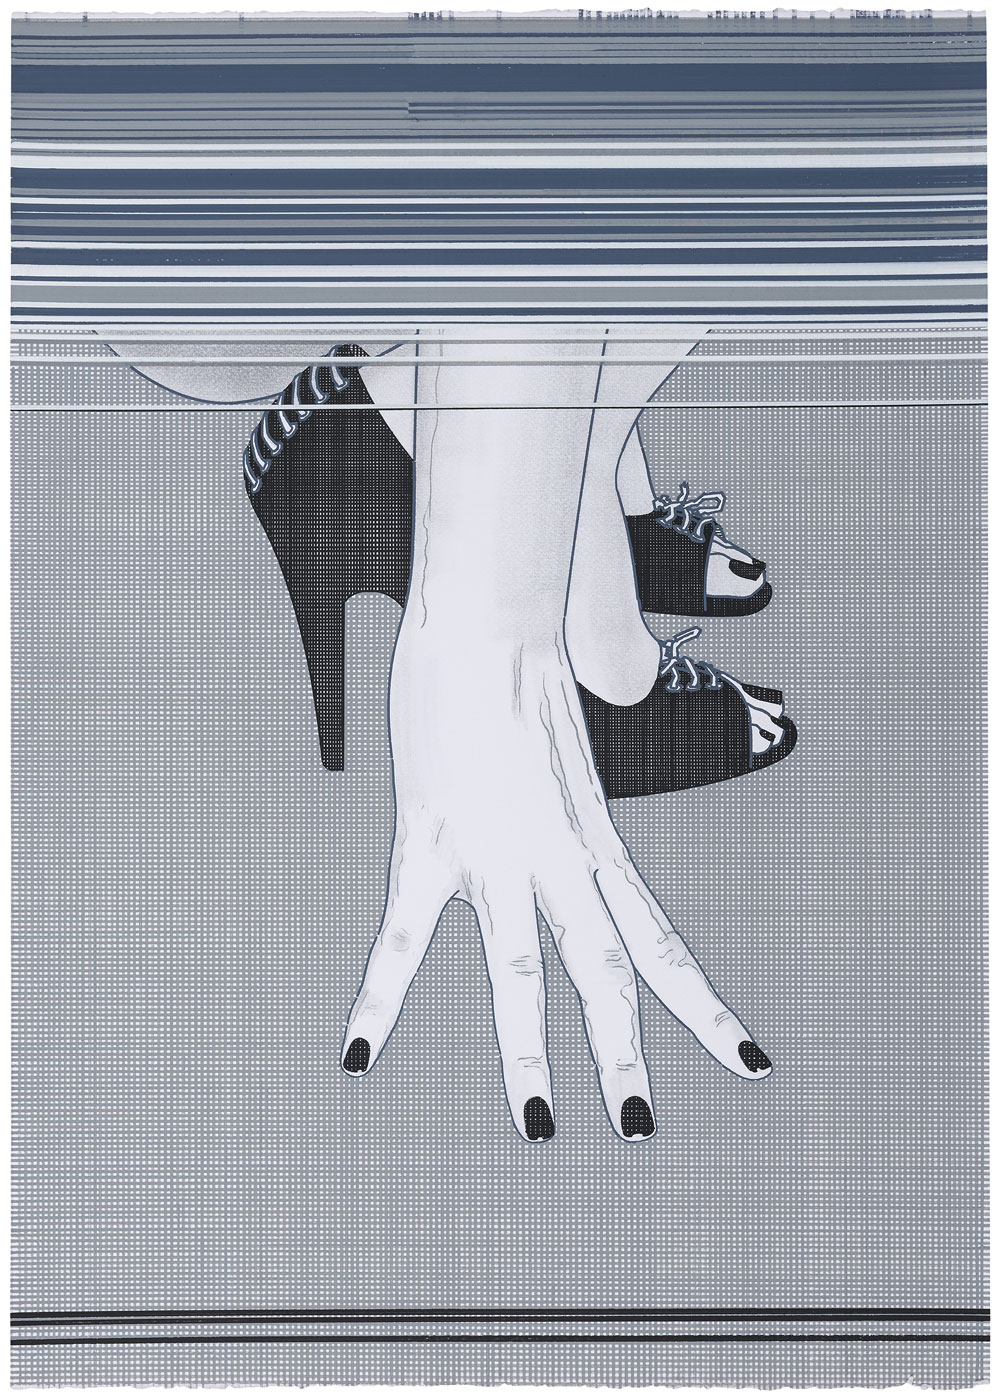 Rear Window (1) , 2016-2017. Acuarela y témpera sobre papel, 71 x 50 cm.